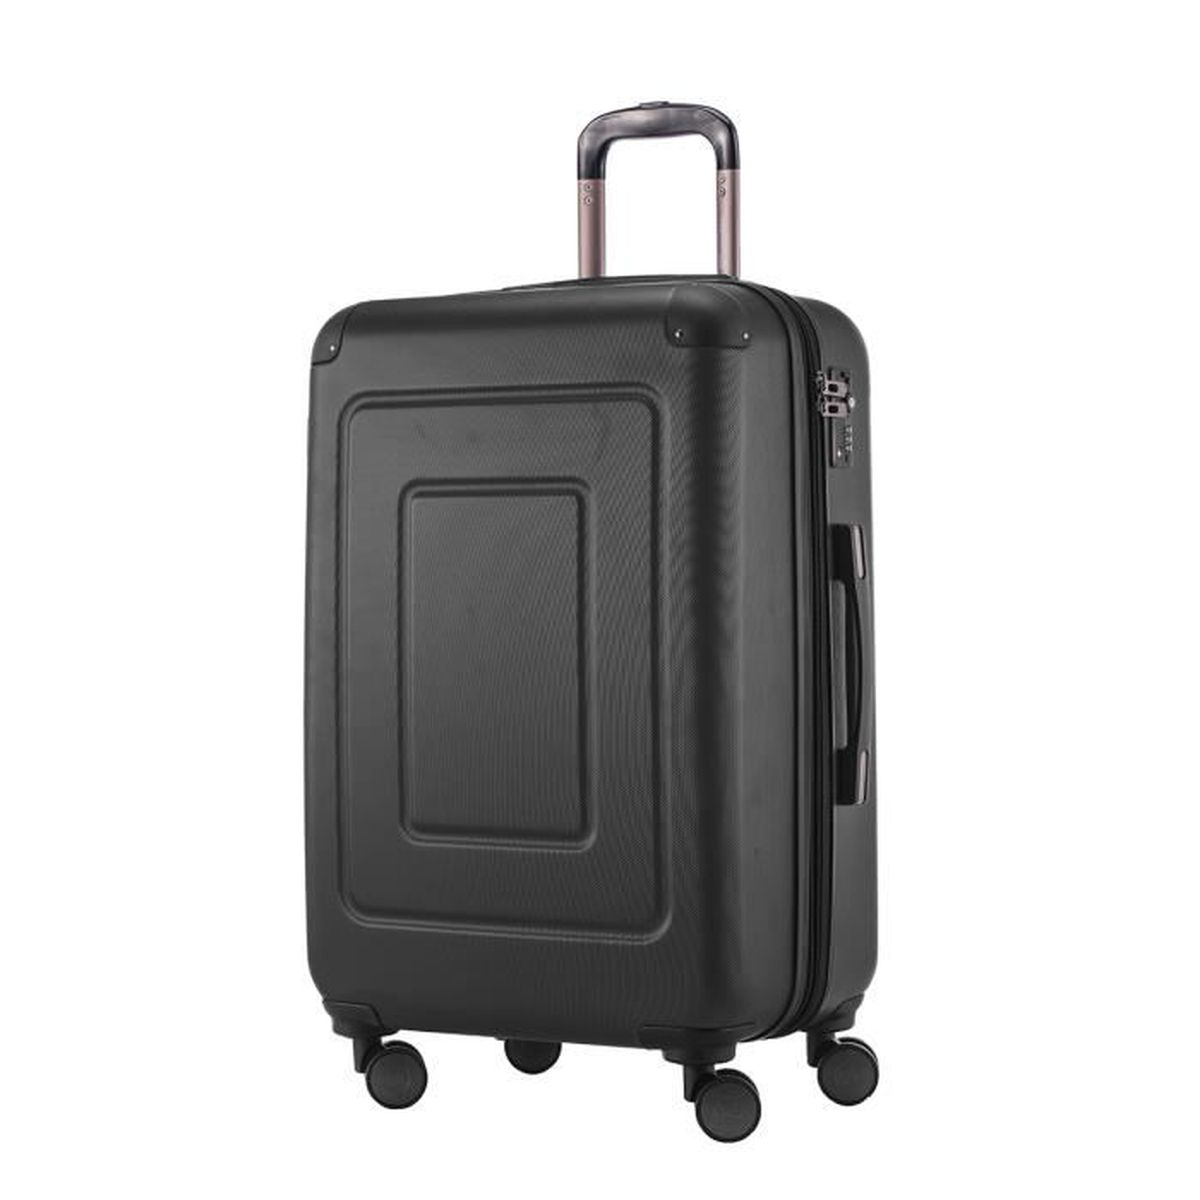 "30/"" Super Léger Durable ABS rigide Trolley Valise Bagage Sac Voyage"